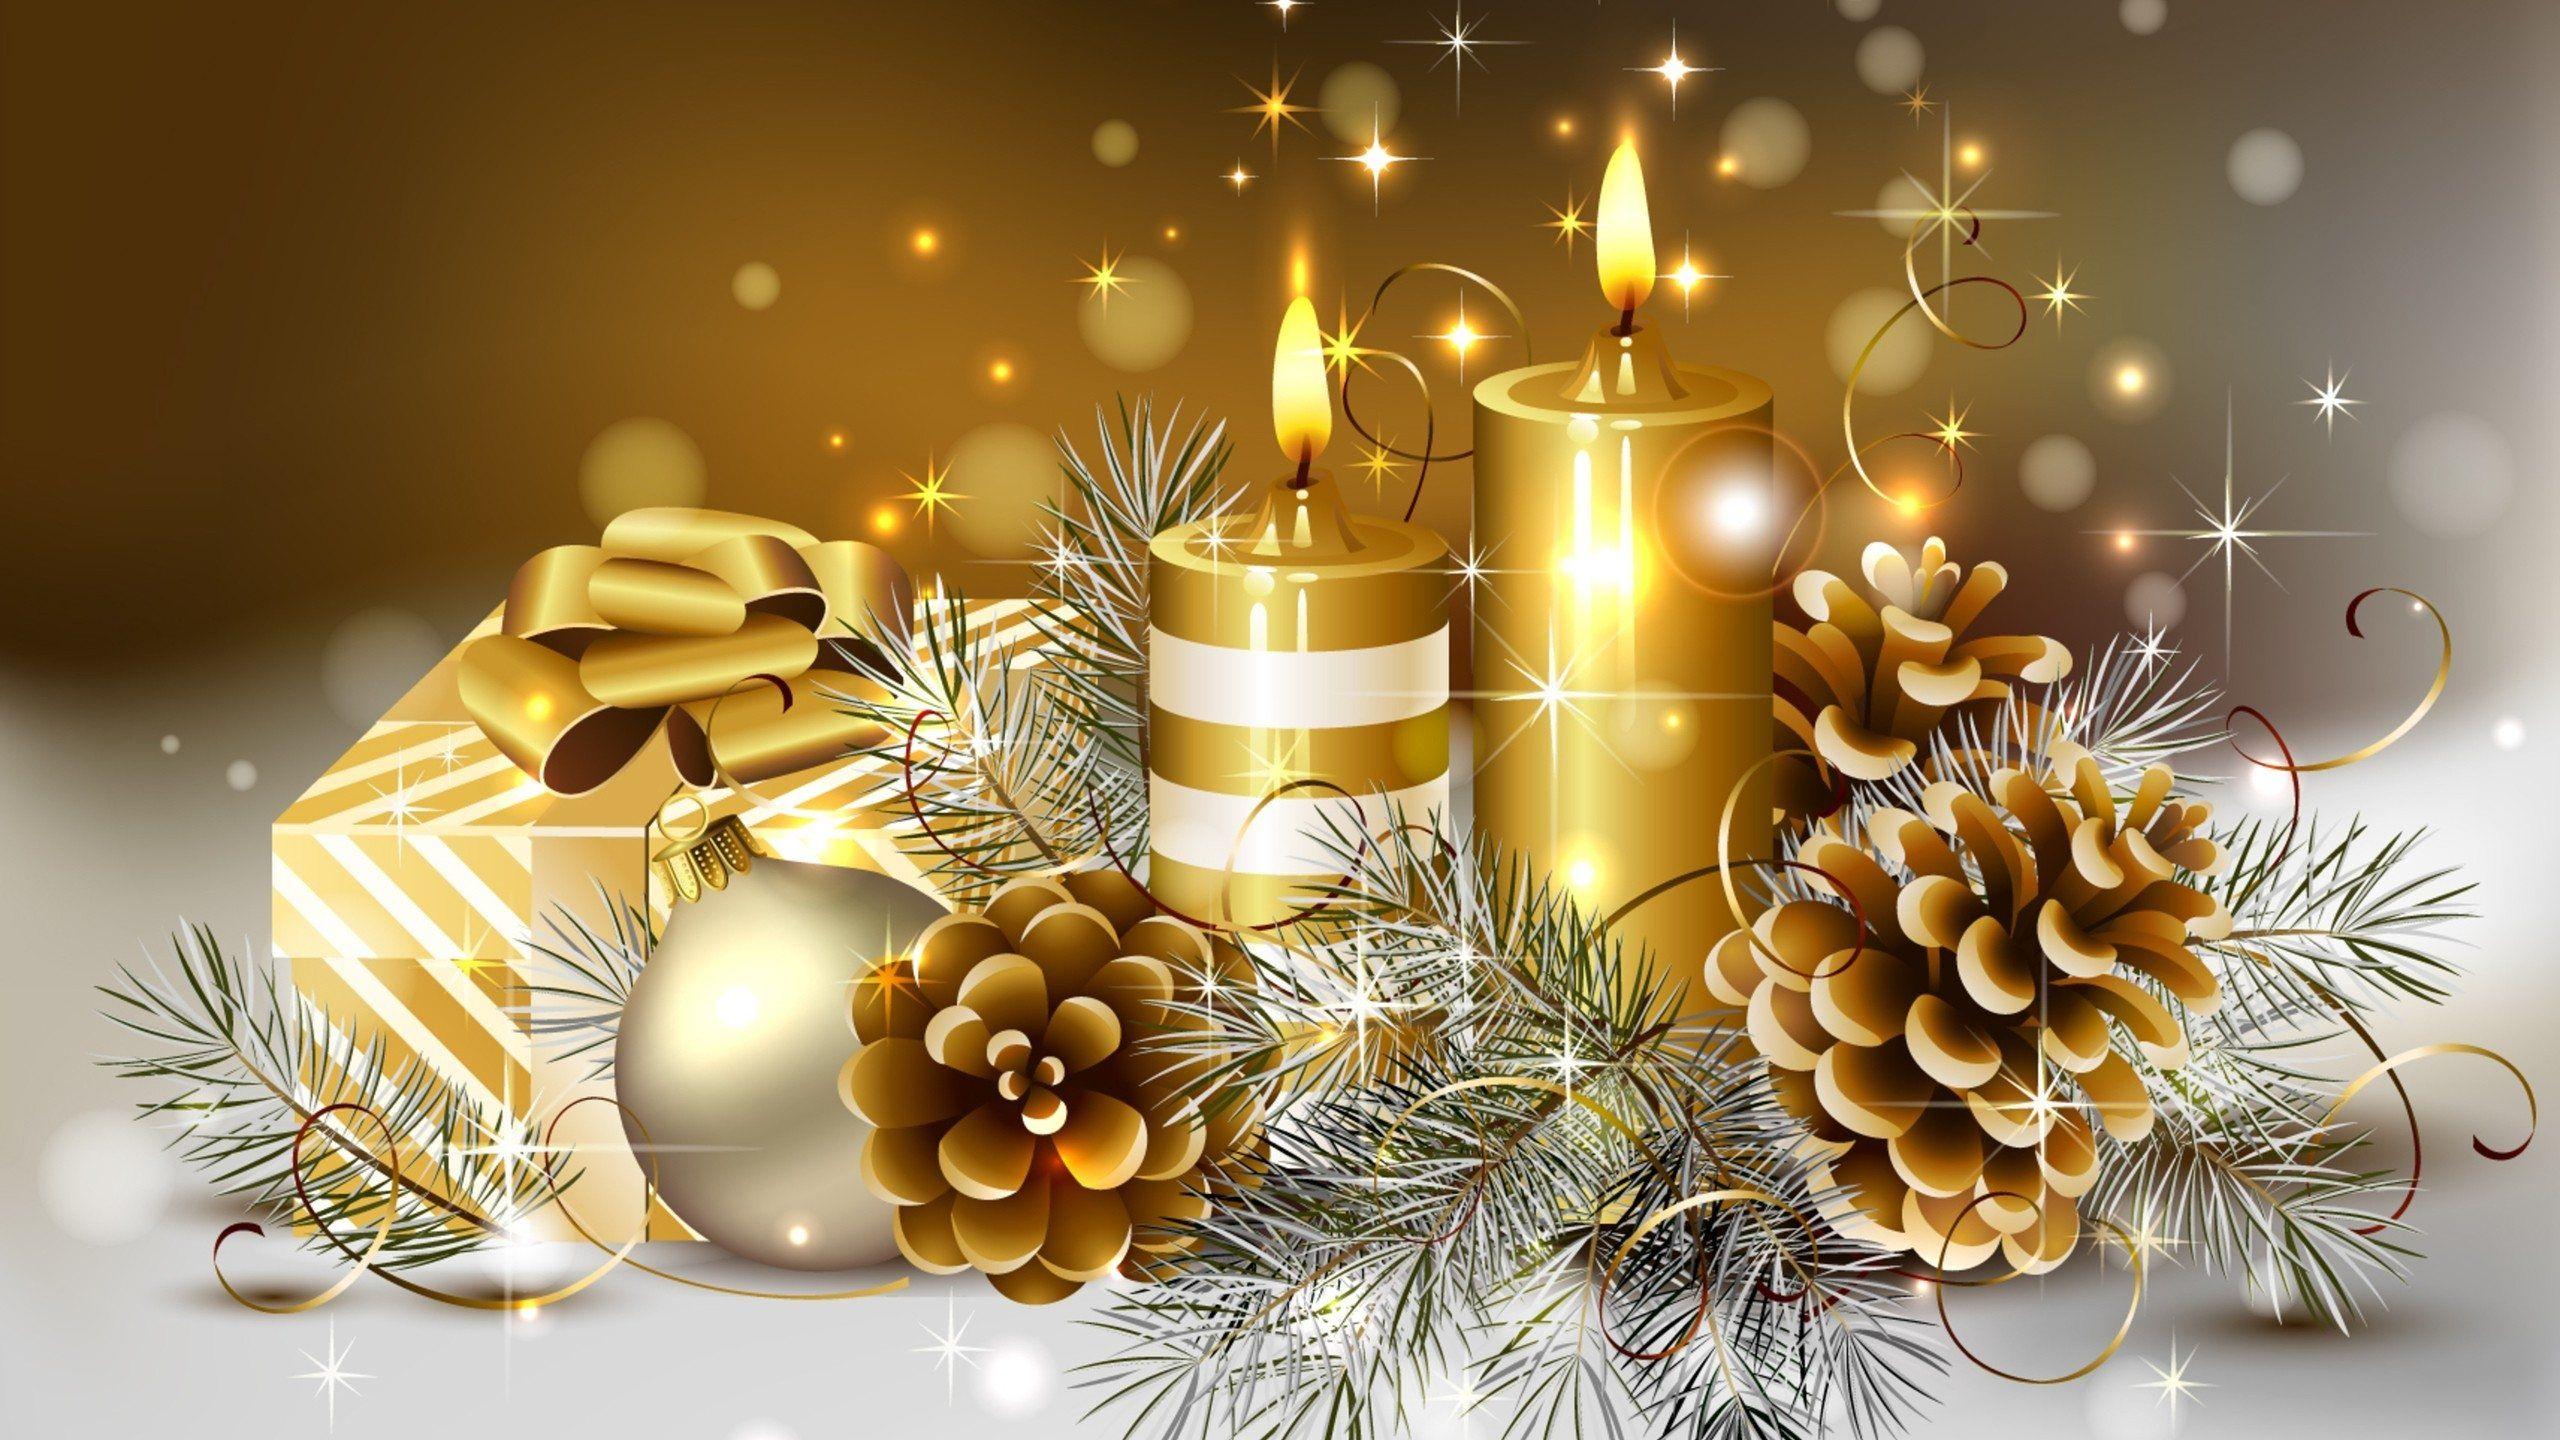 Winter-Holiday-Decoration